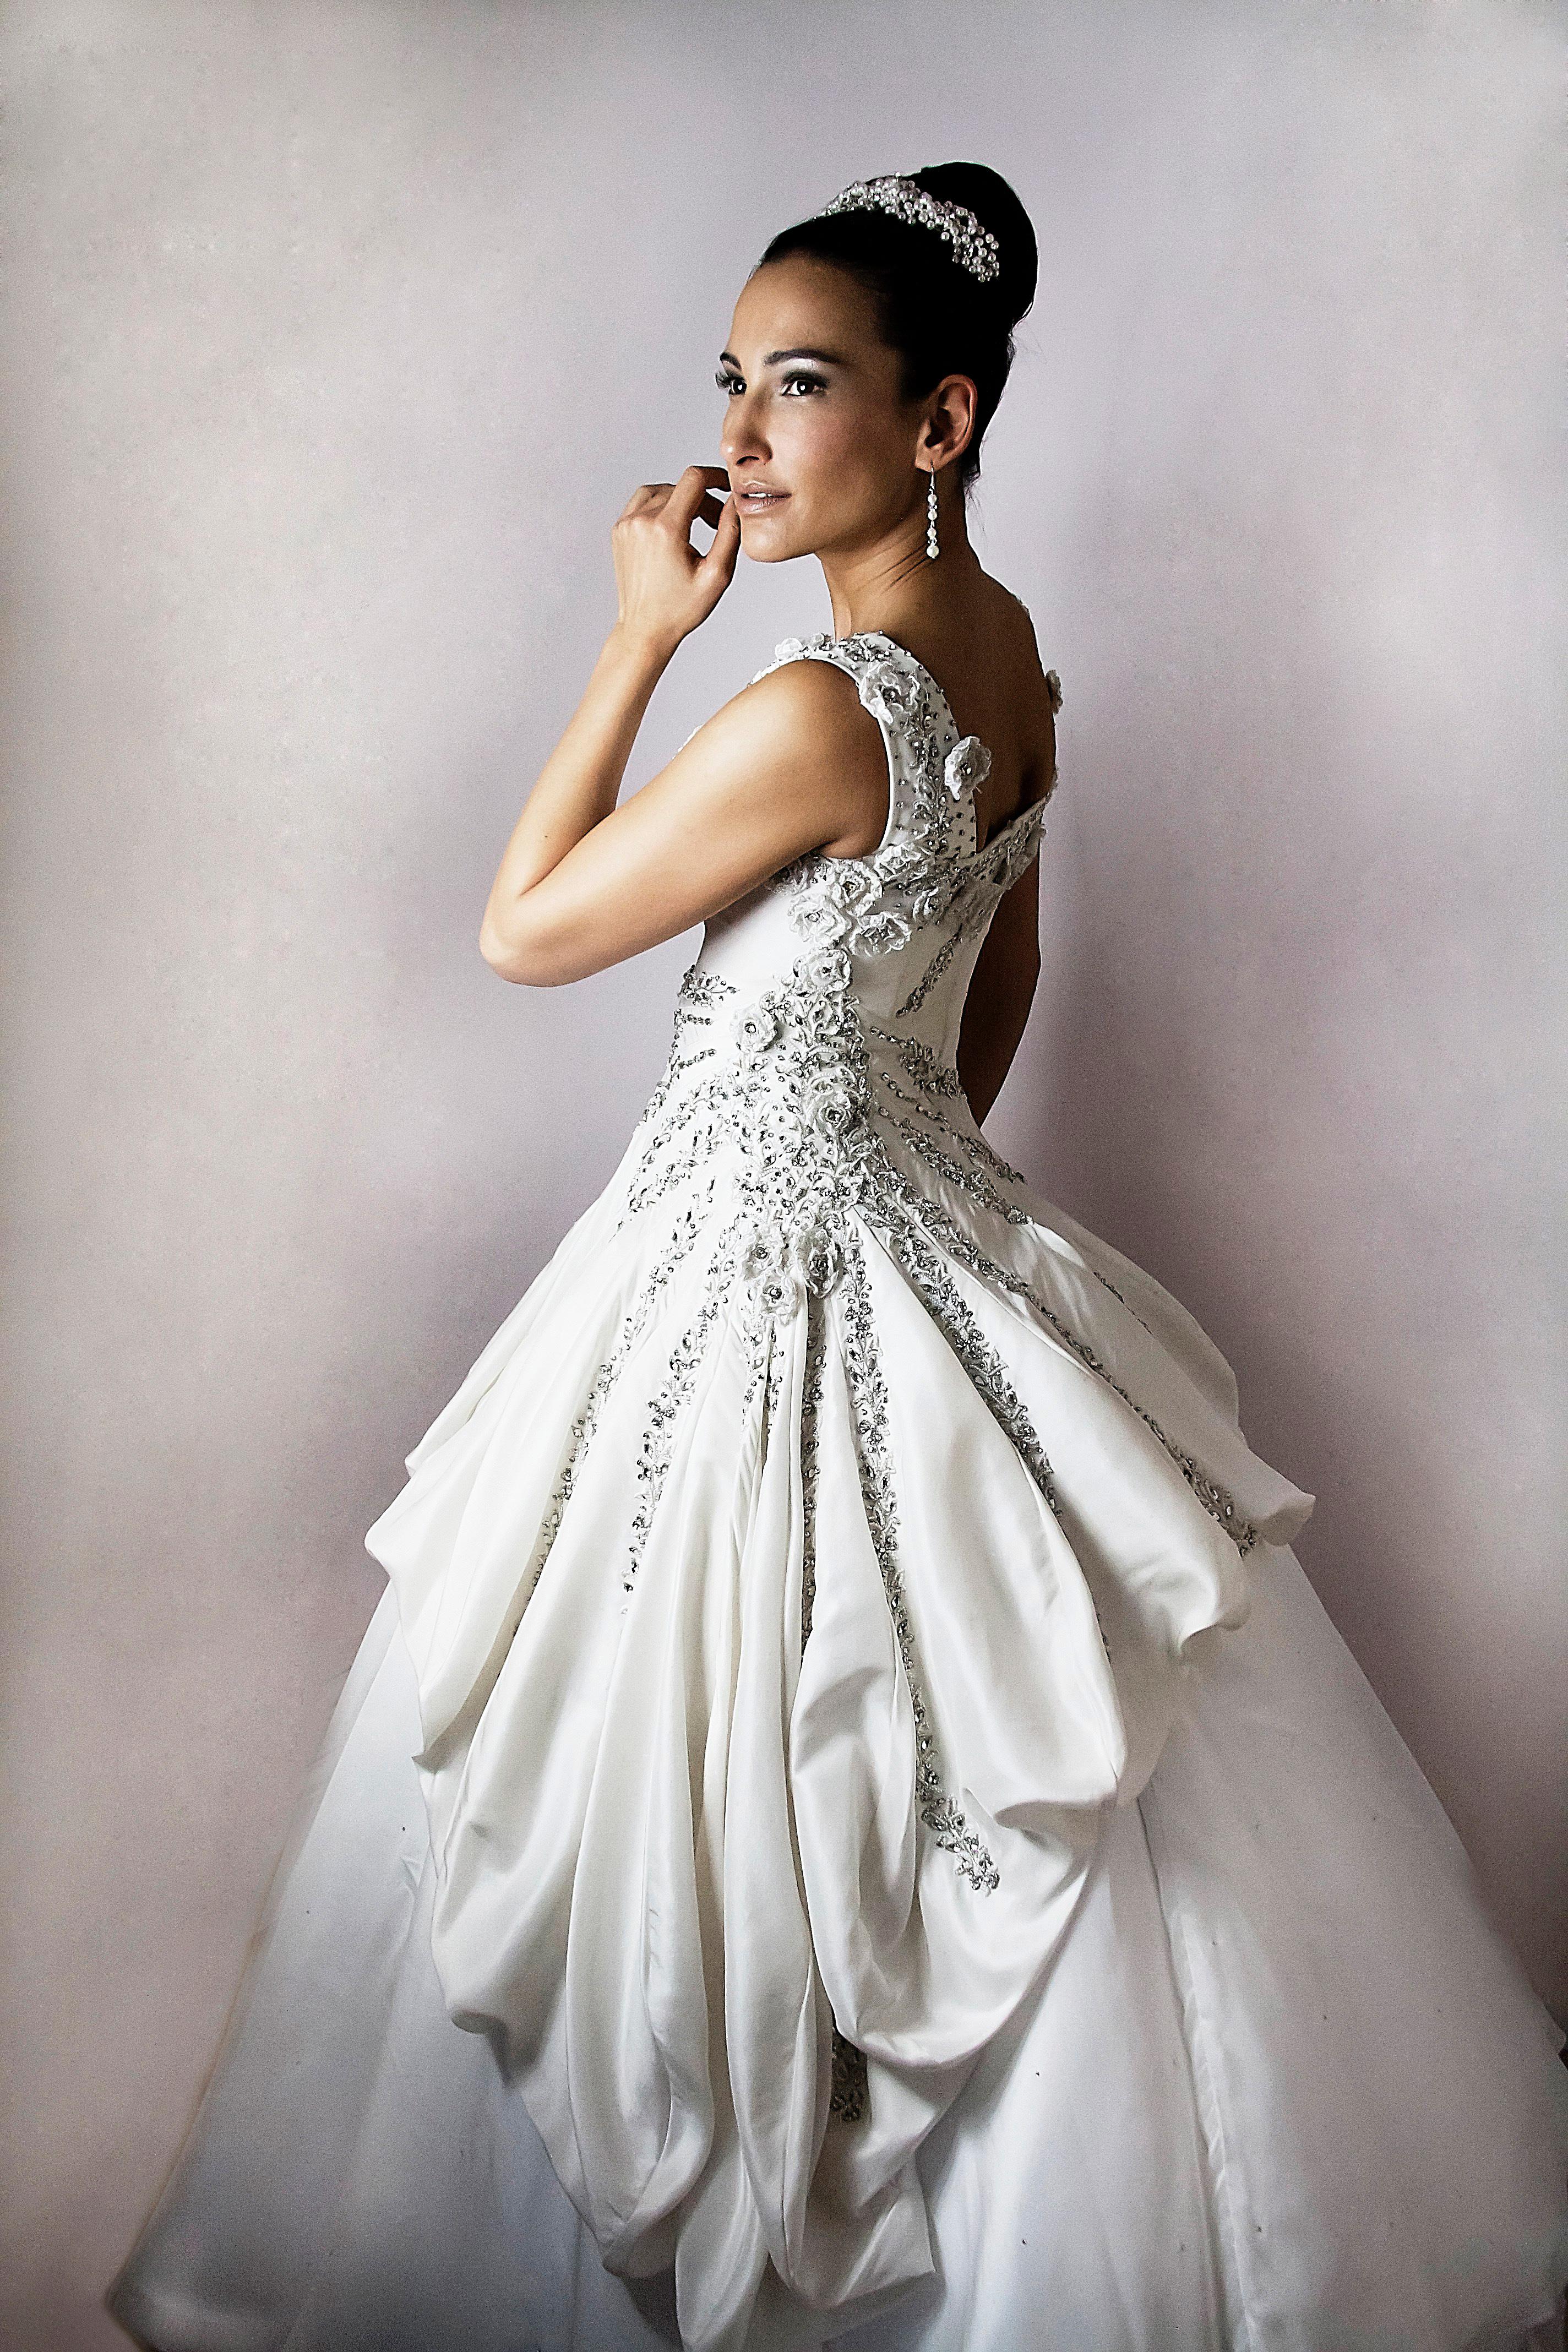 13_dress4_MG_3540